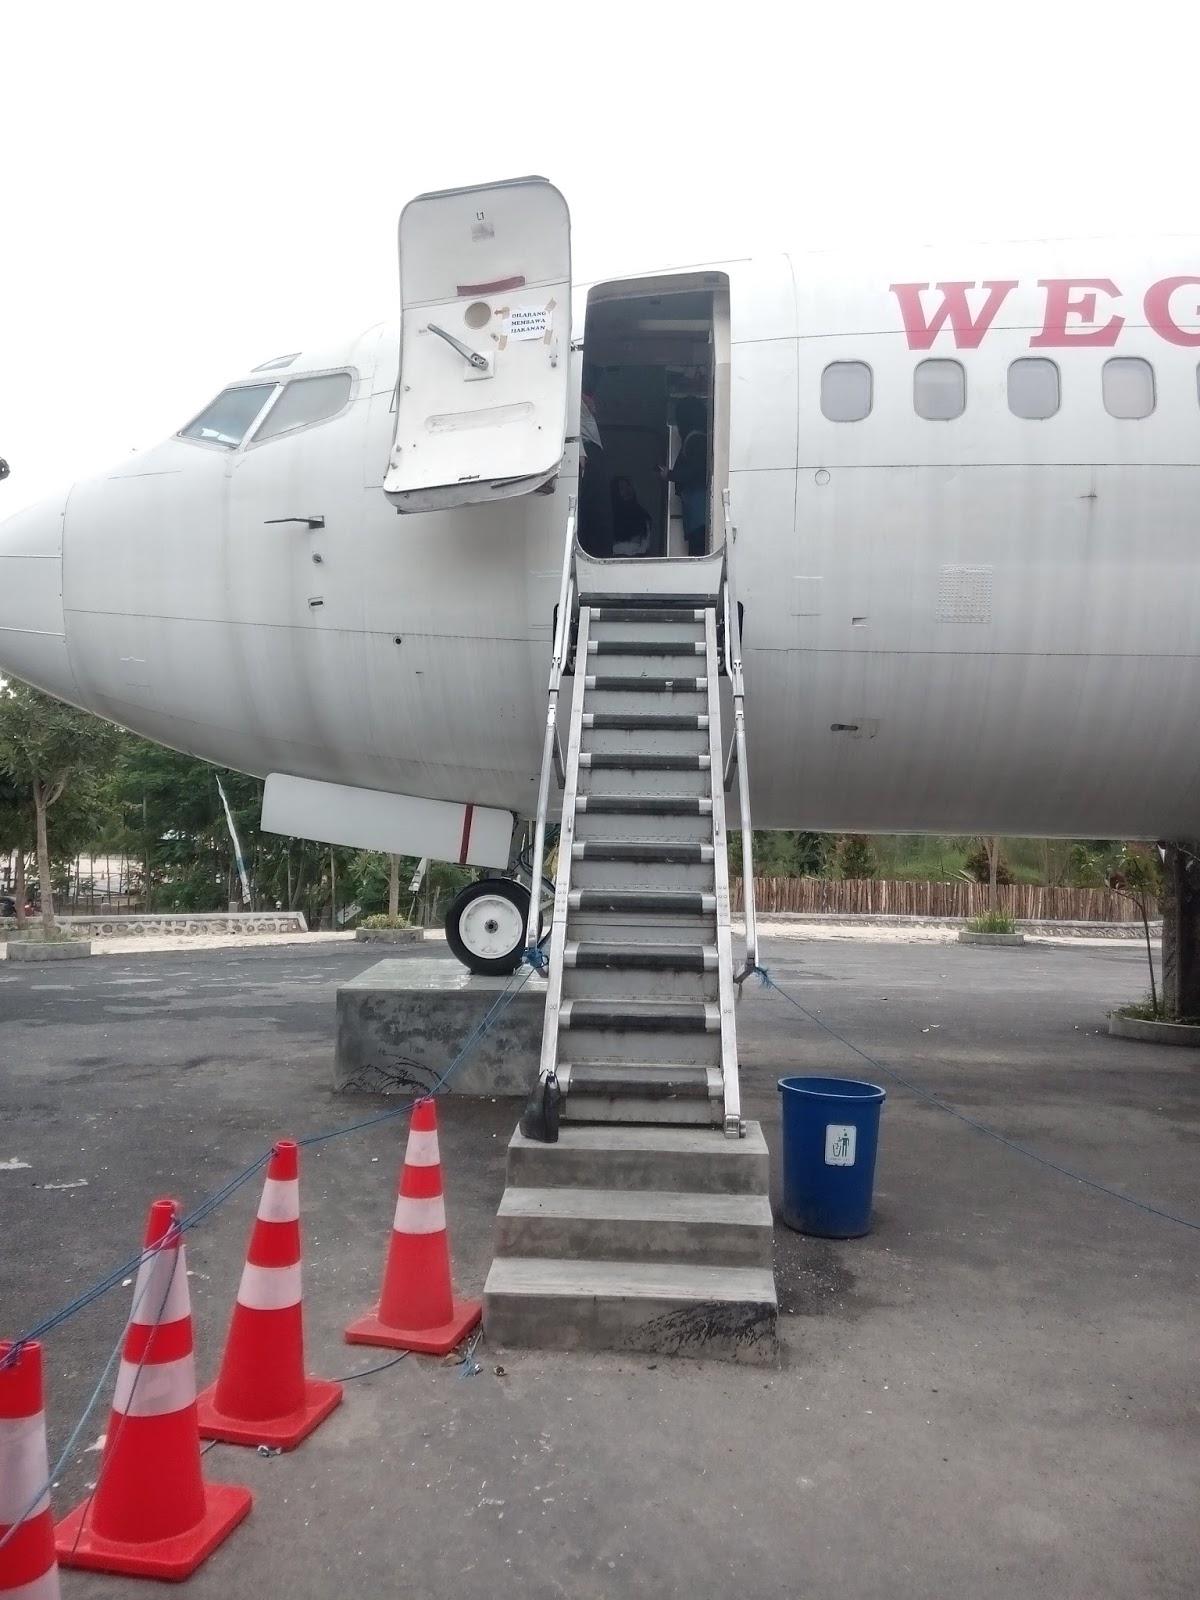 Lokasi Wego Lamongan Wisata Terbaru Unik Banget Pesawat Bisa Dibilang